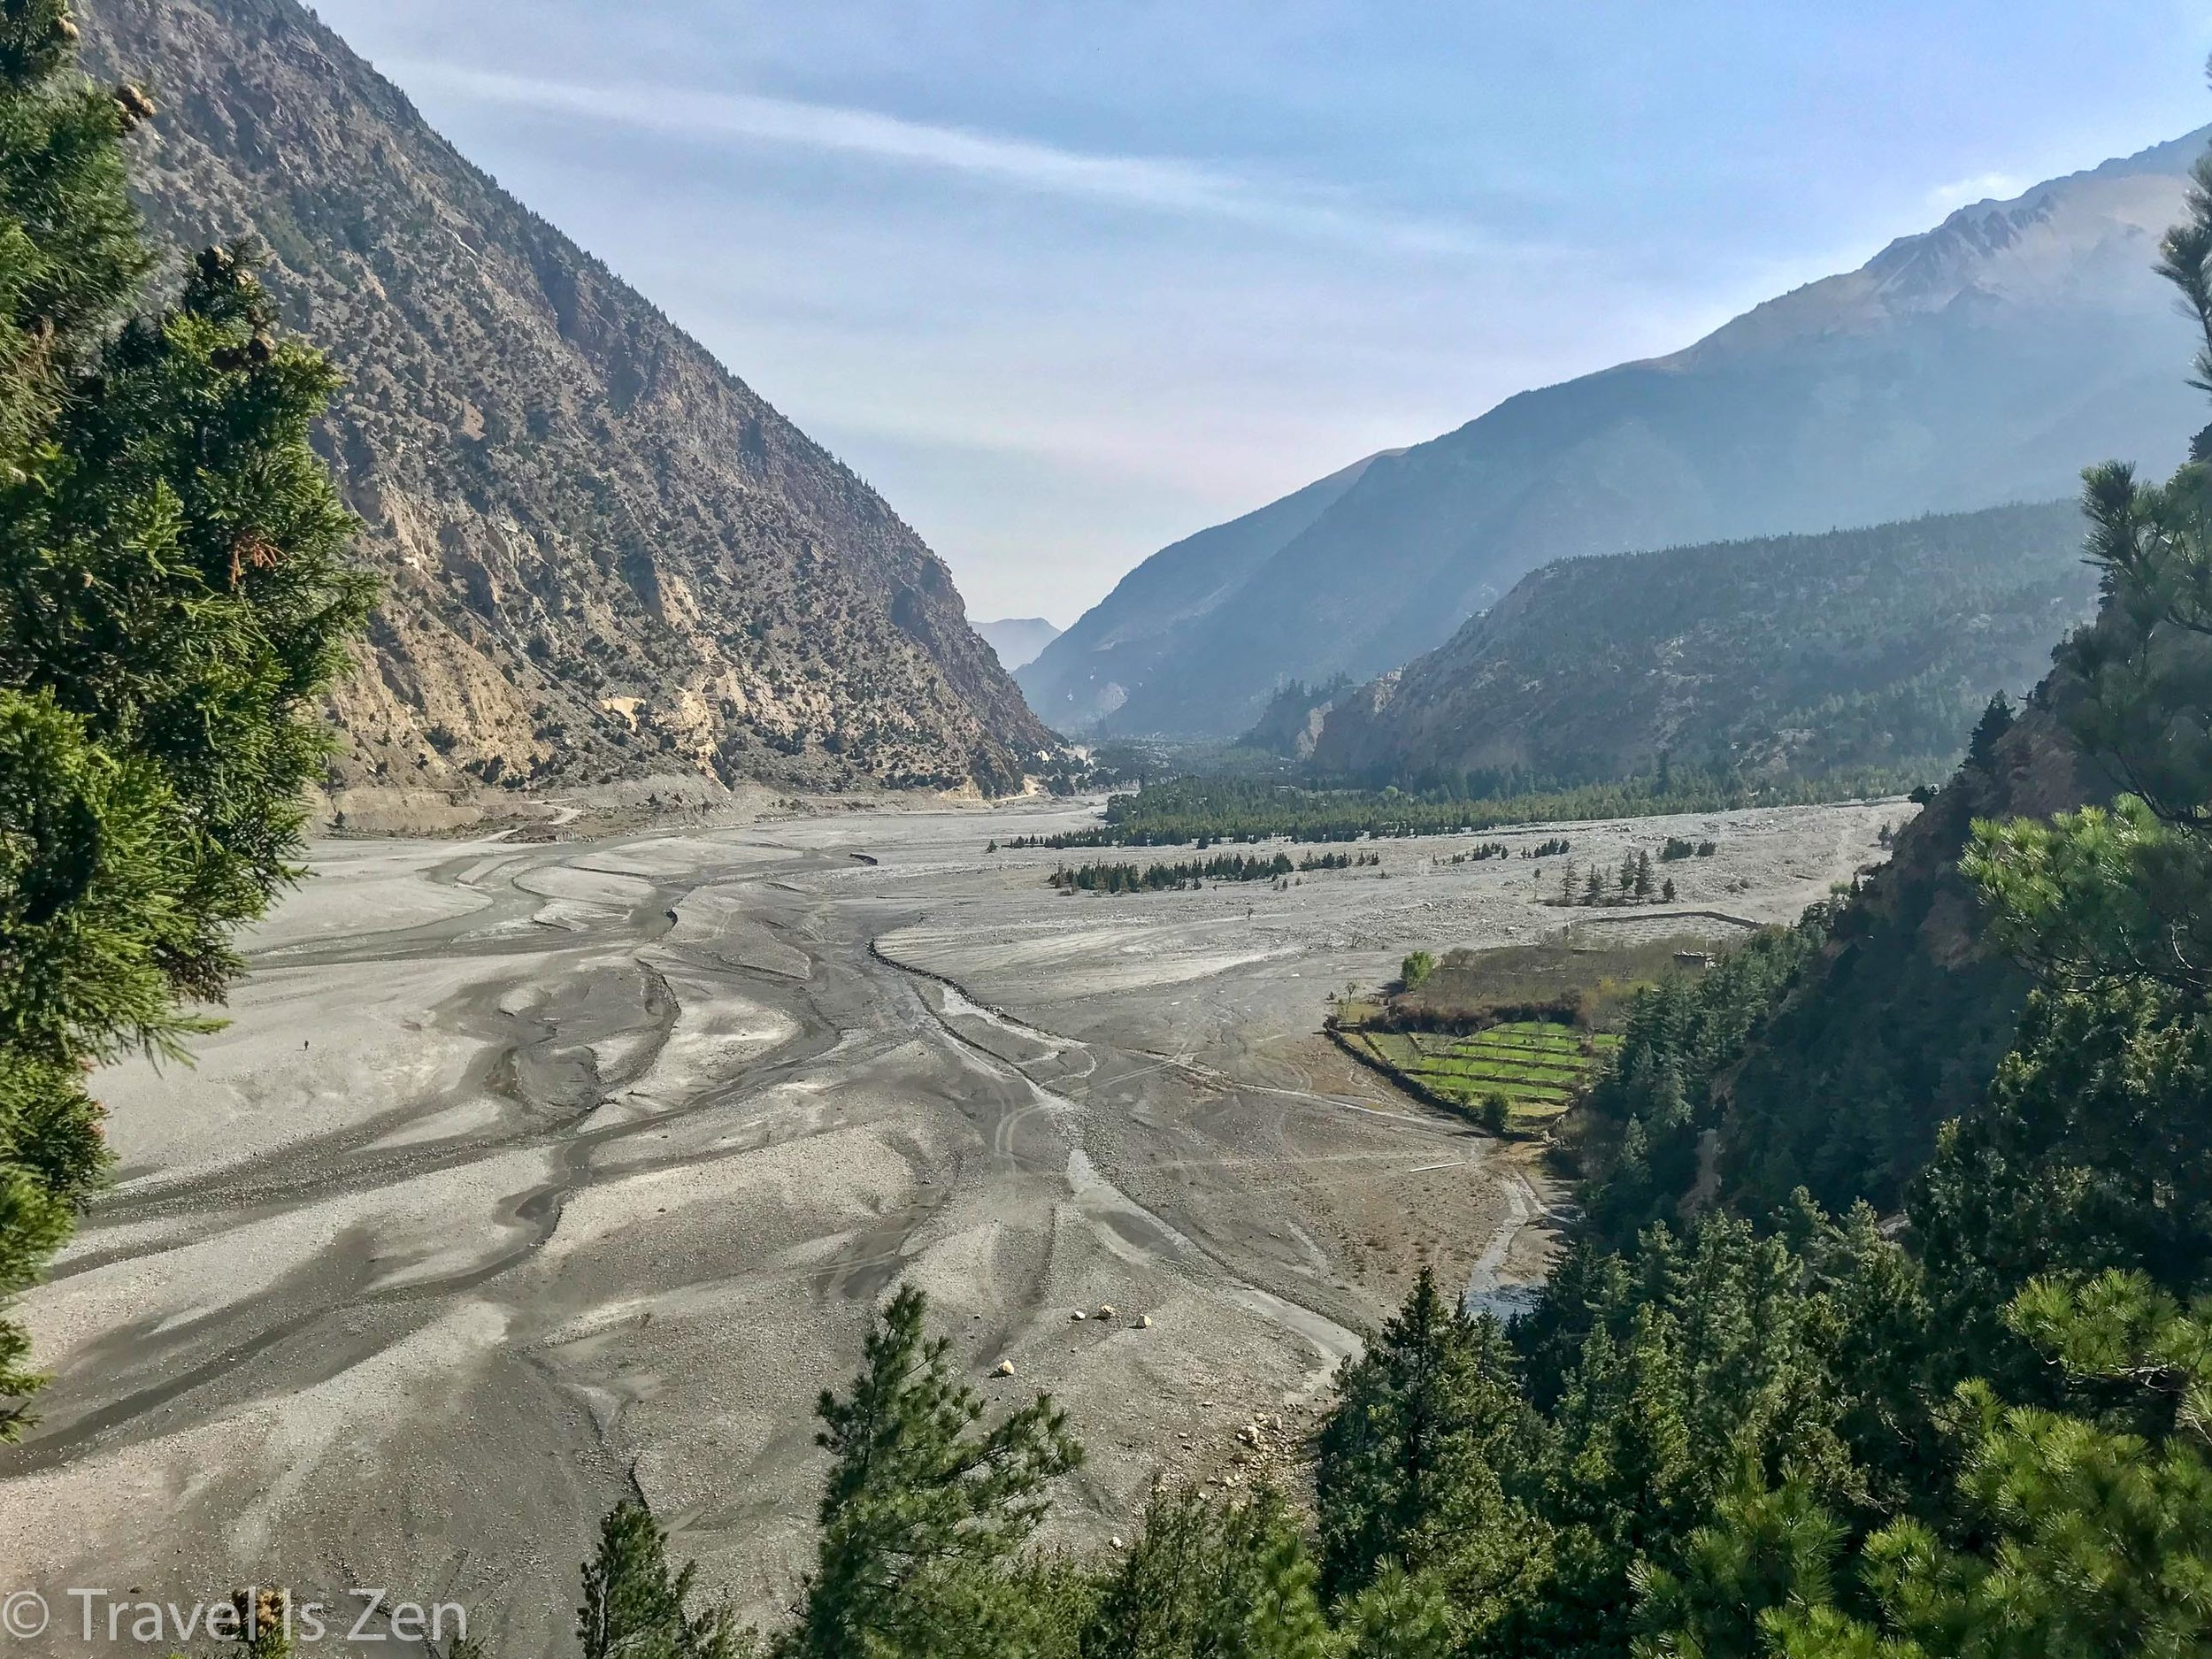 Kali Gandaki River Basin